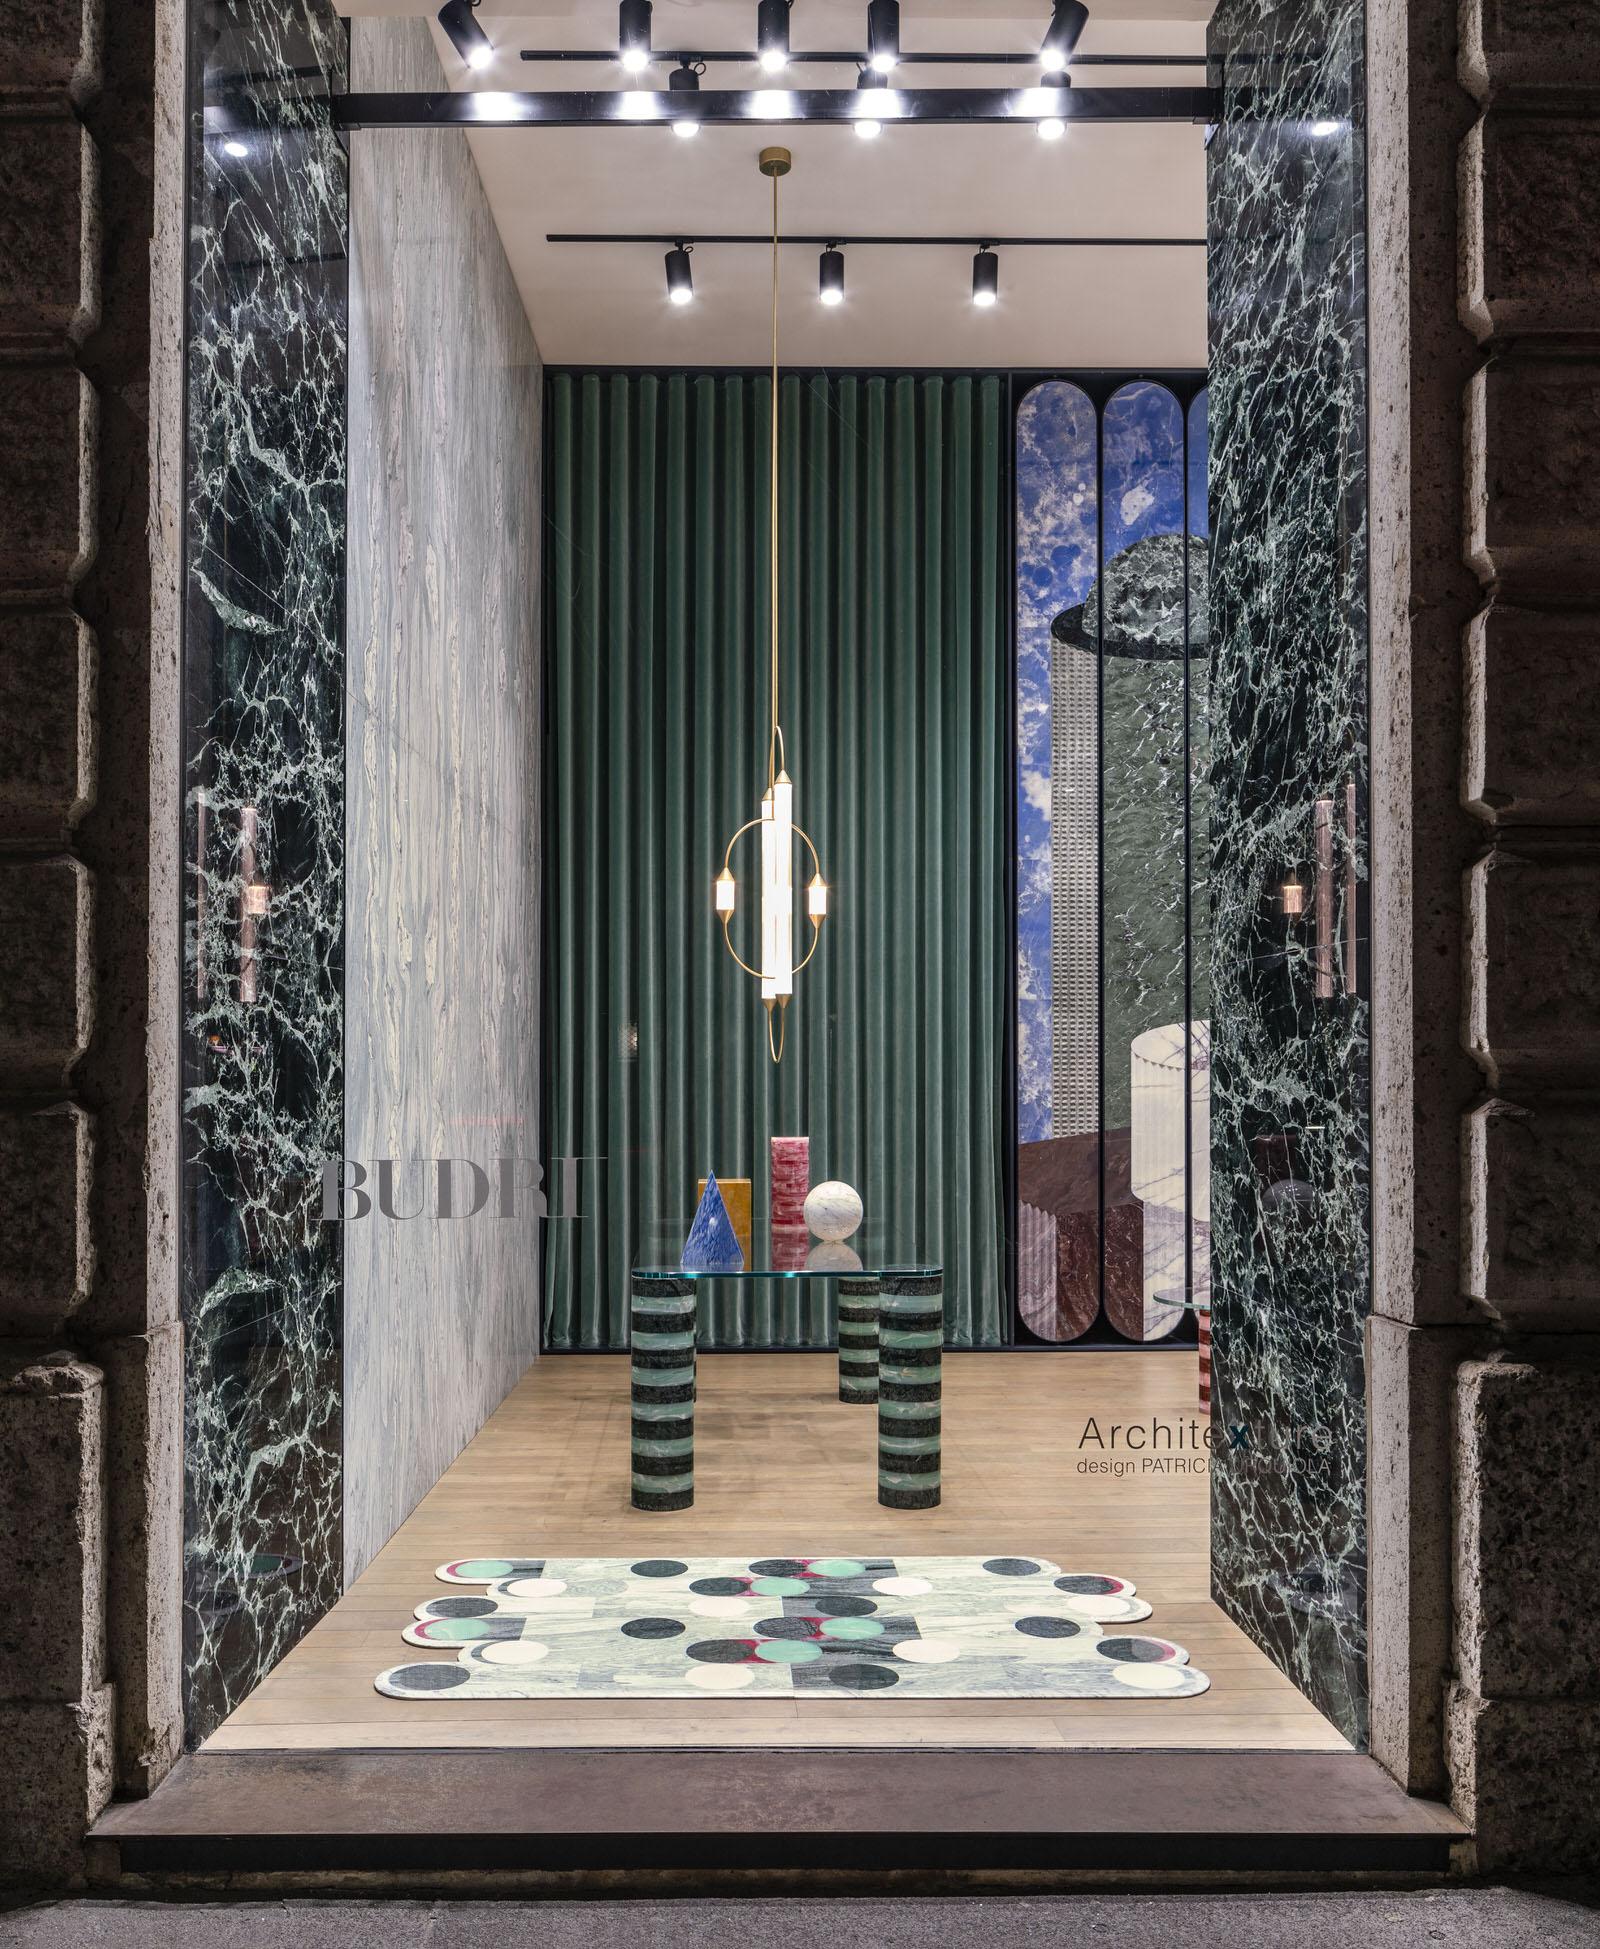 Yellowtrace Milan Design Week 2021 Budri Architexture 01